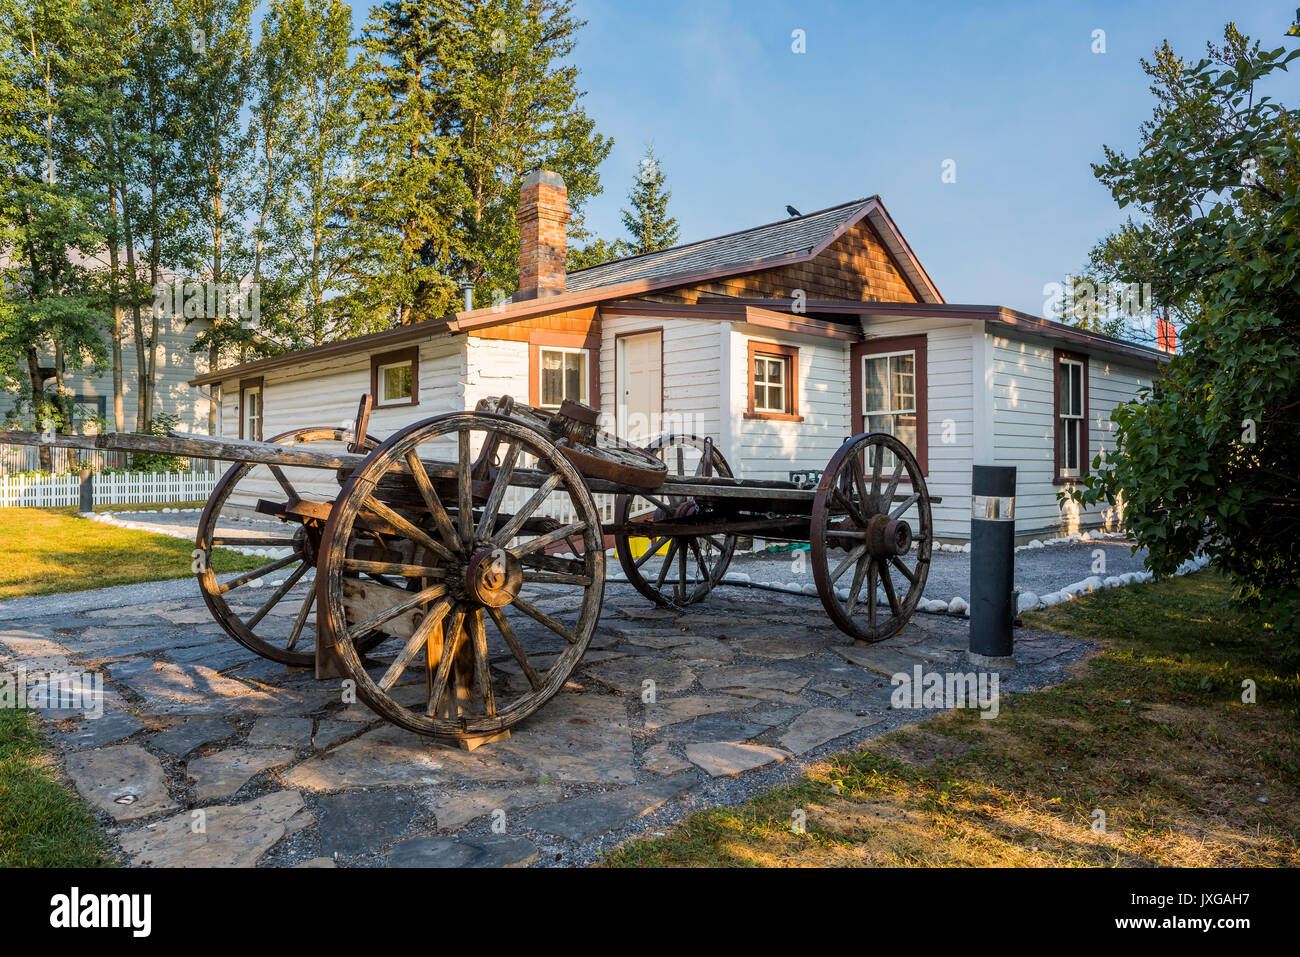 Northwest Mounted Police Barracks, Canmore, Alberta, Canada - Stock Image